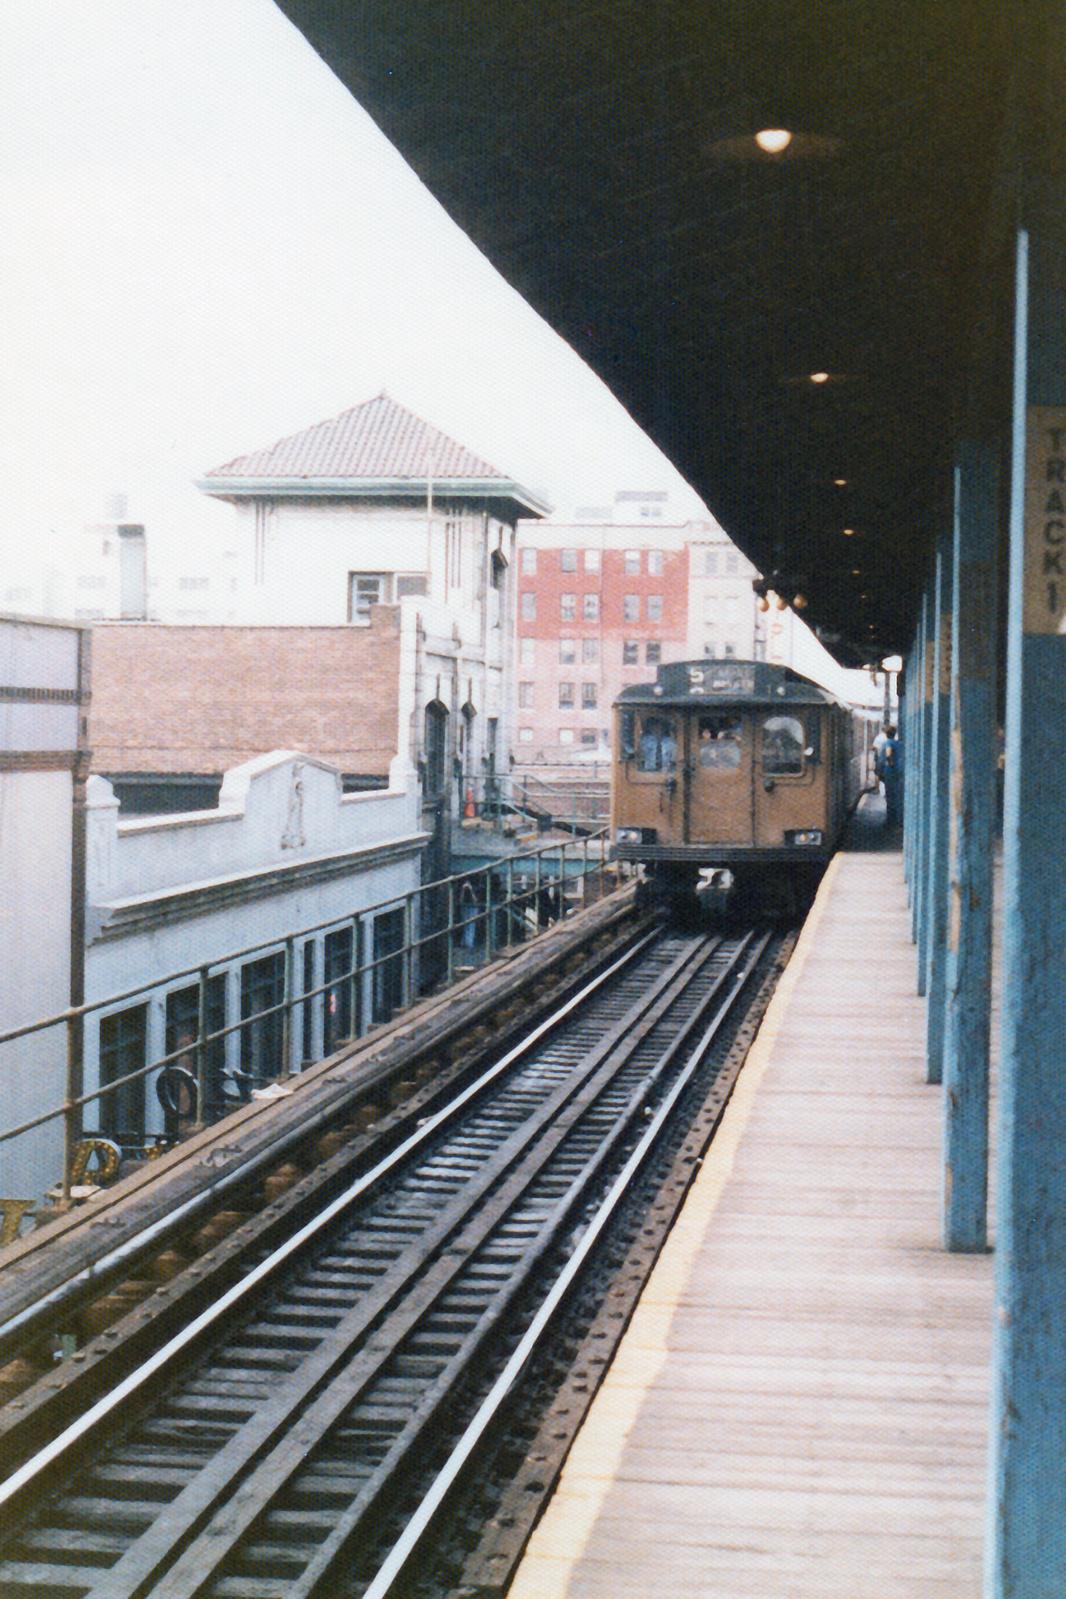 (921k, 1066x1599)<br><b>Country:</b> United States<br><b>City:</b> New York<br><b>System:</b> New York City Transit<br><b>Line:</b> BMT Nassau Street/Jamaica Line<br><b>Location:</b> 168th Street (Demolished) <br><b>Route:</b> Fan Trip<br><b>Car:</b> BMT D-Type Triplex 6019 <br><b>Collection of:</b> Nicholas Fabrizio<br><b>Date:</b> 9/1/1977<br><b>Viewed (this week/total):</b> 34 / 141